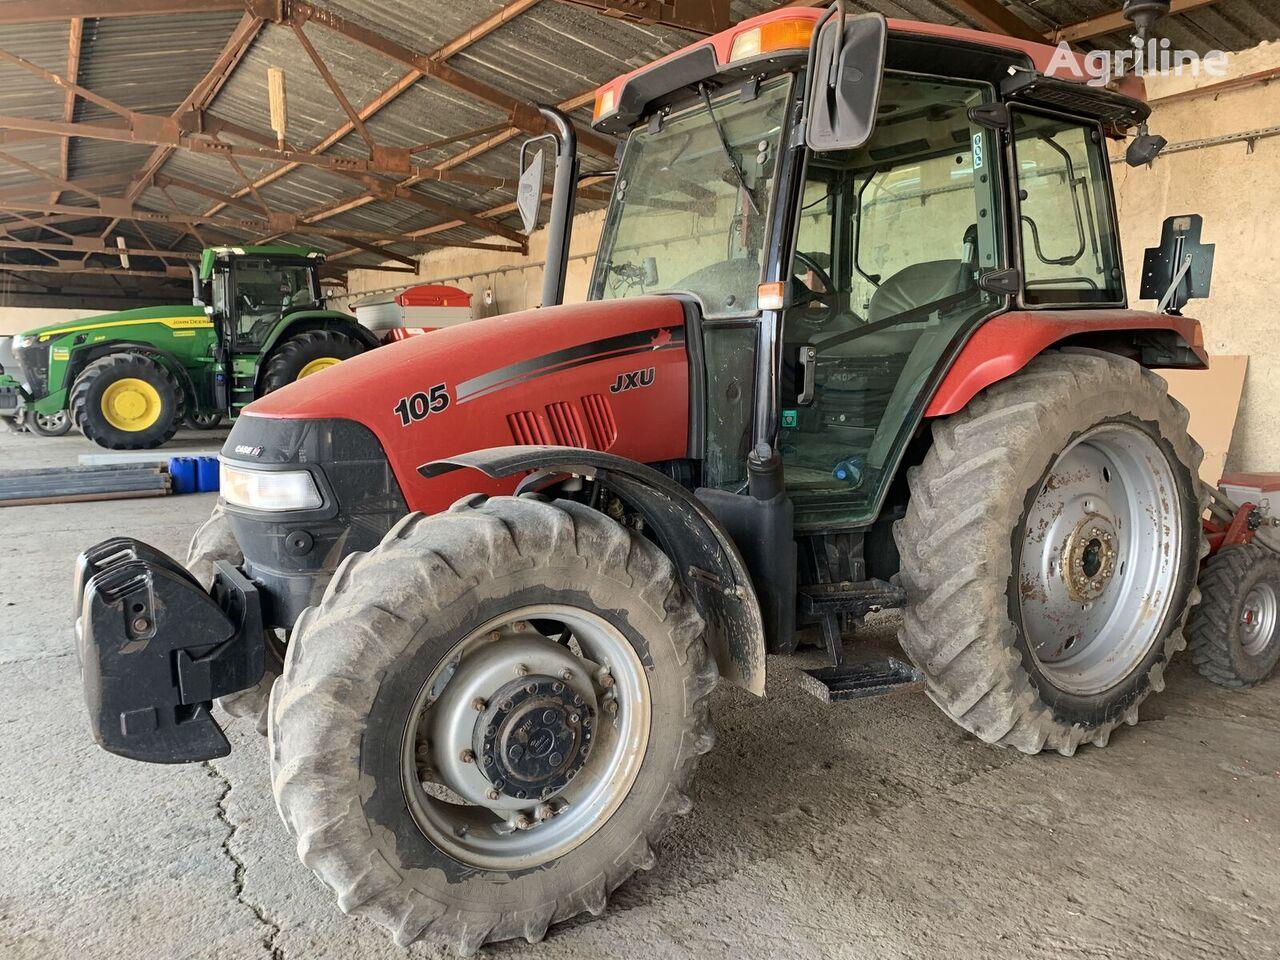 CASE IH JXU 105 wheel tractor